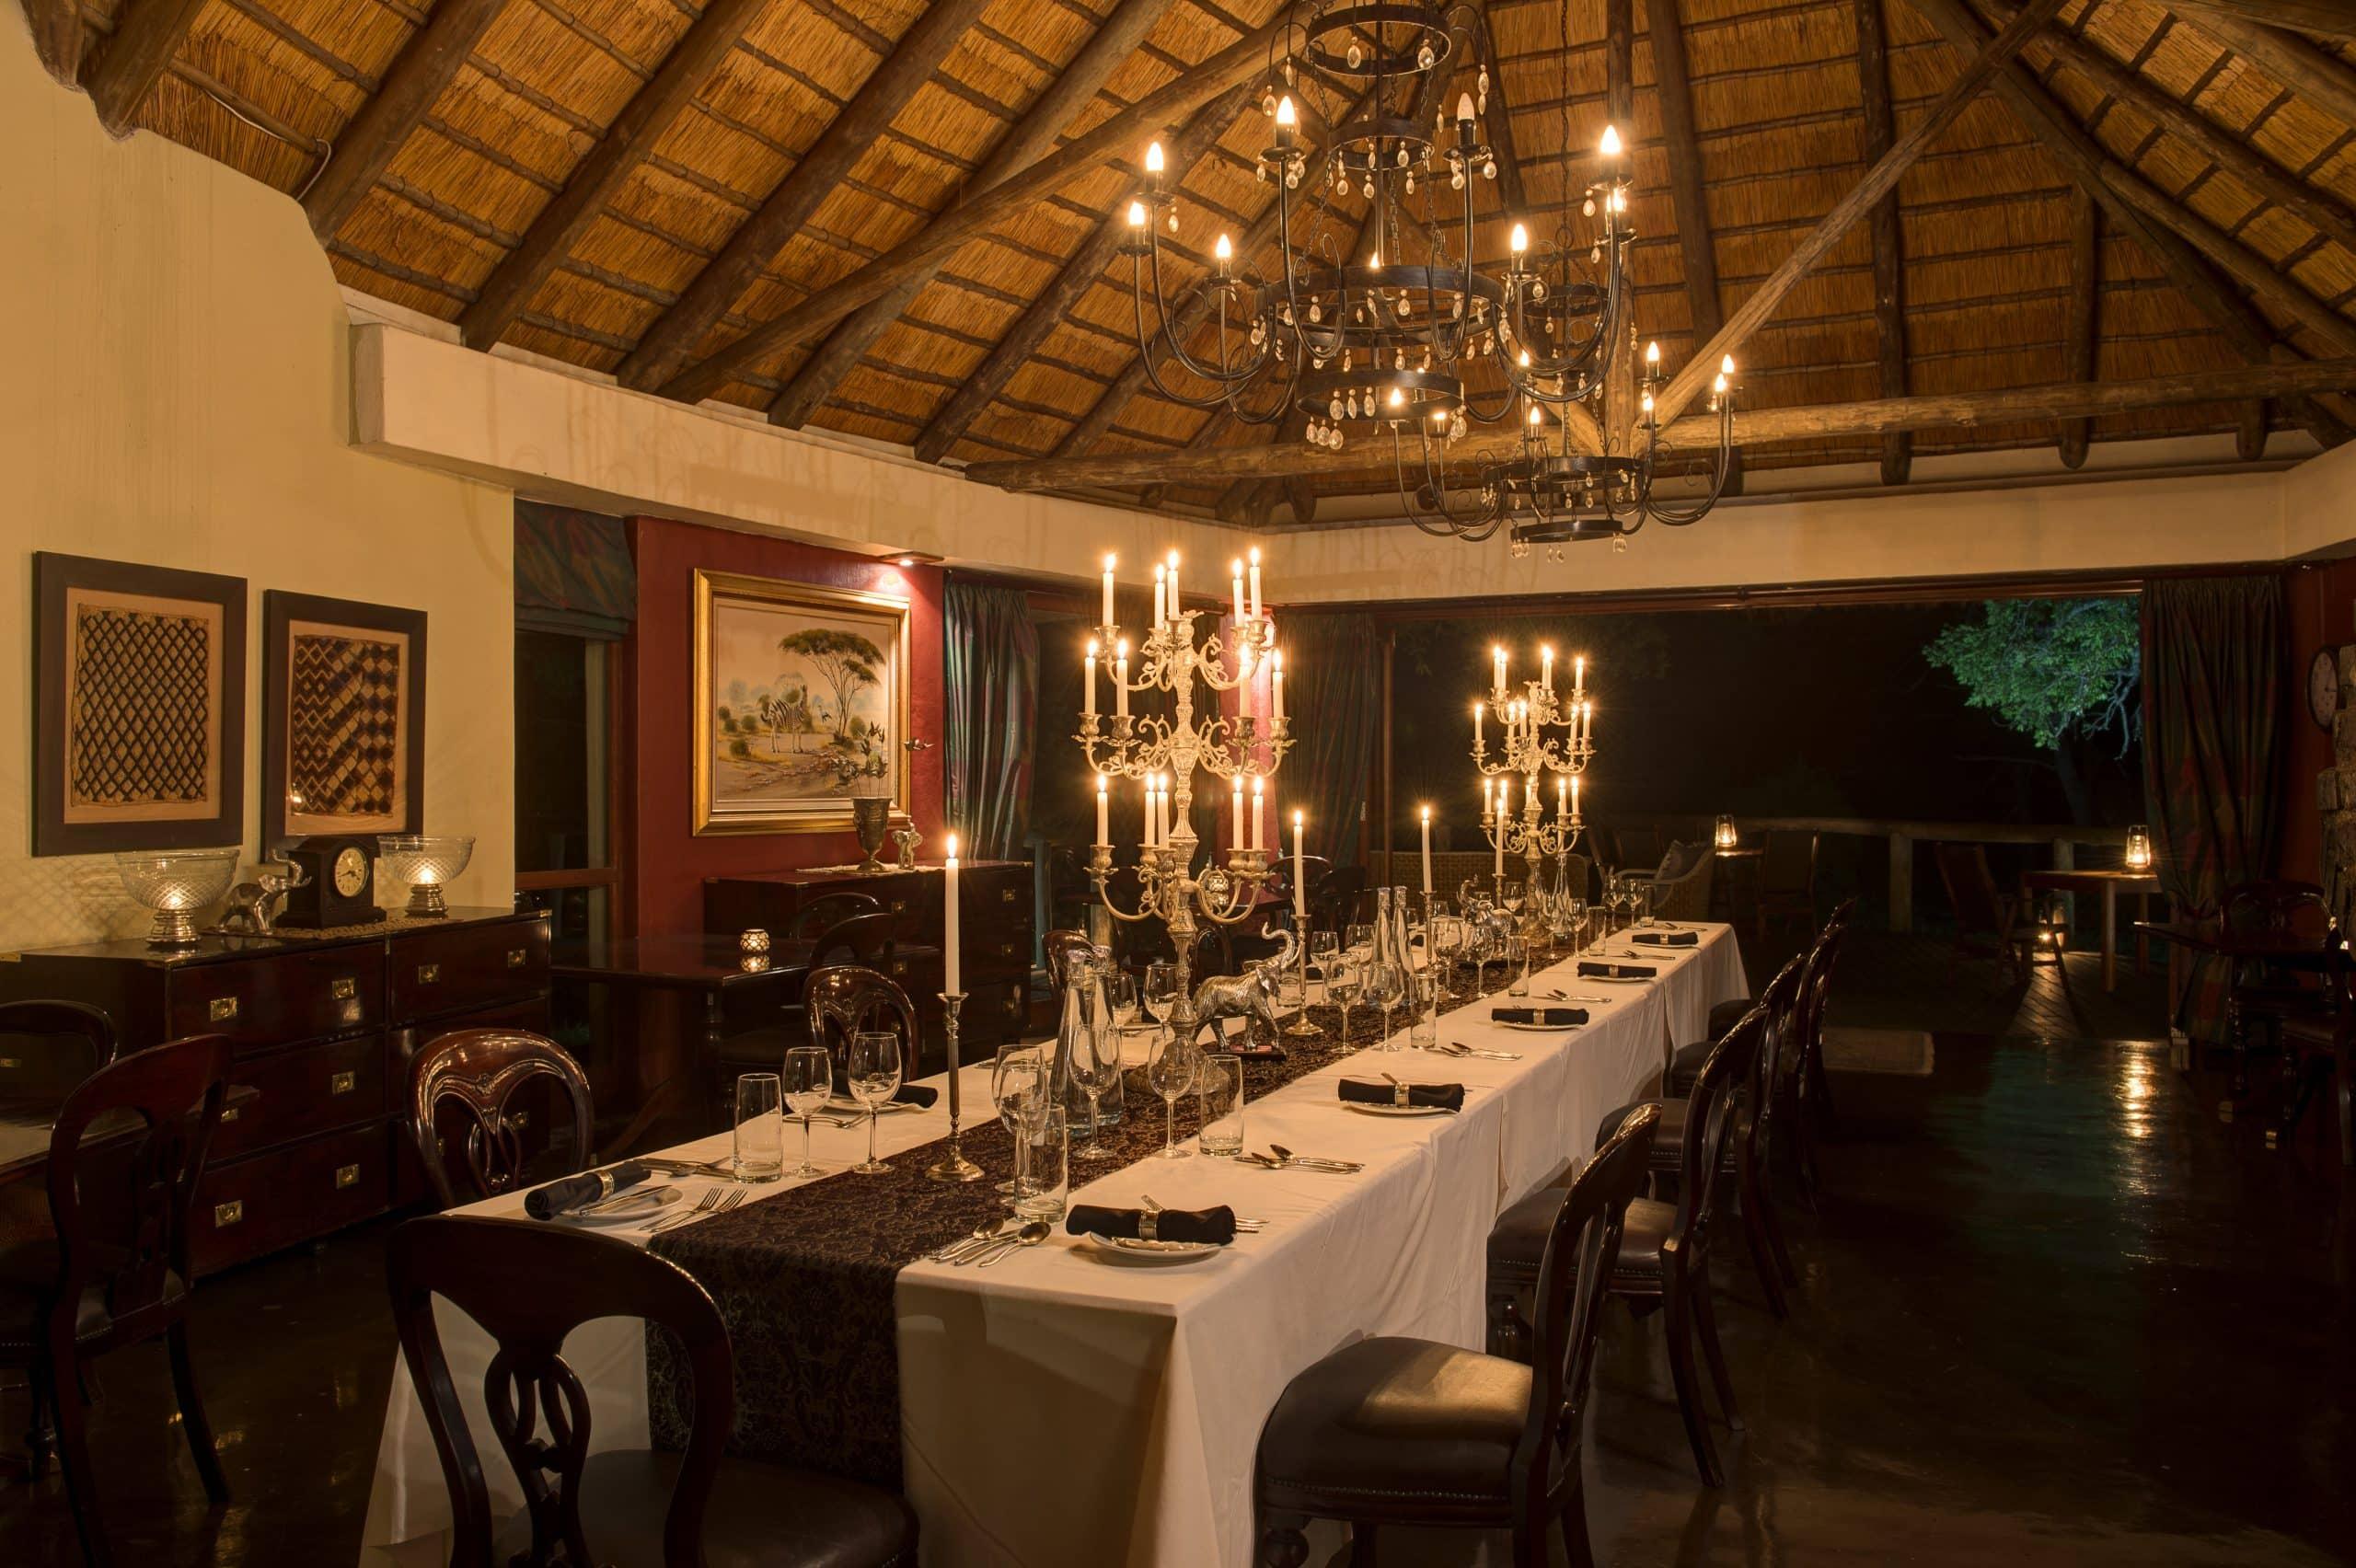 Dining at Tintswalo